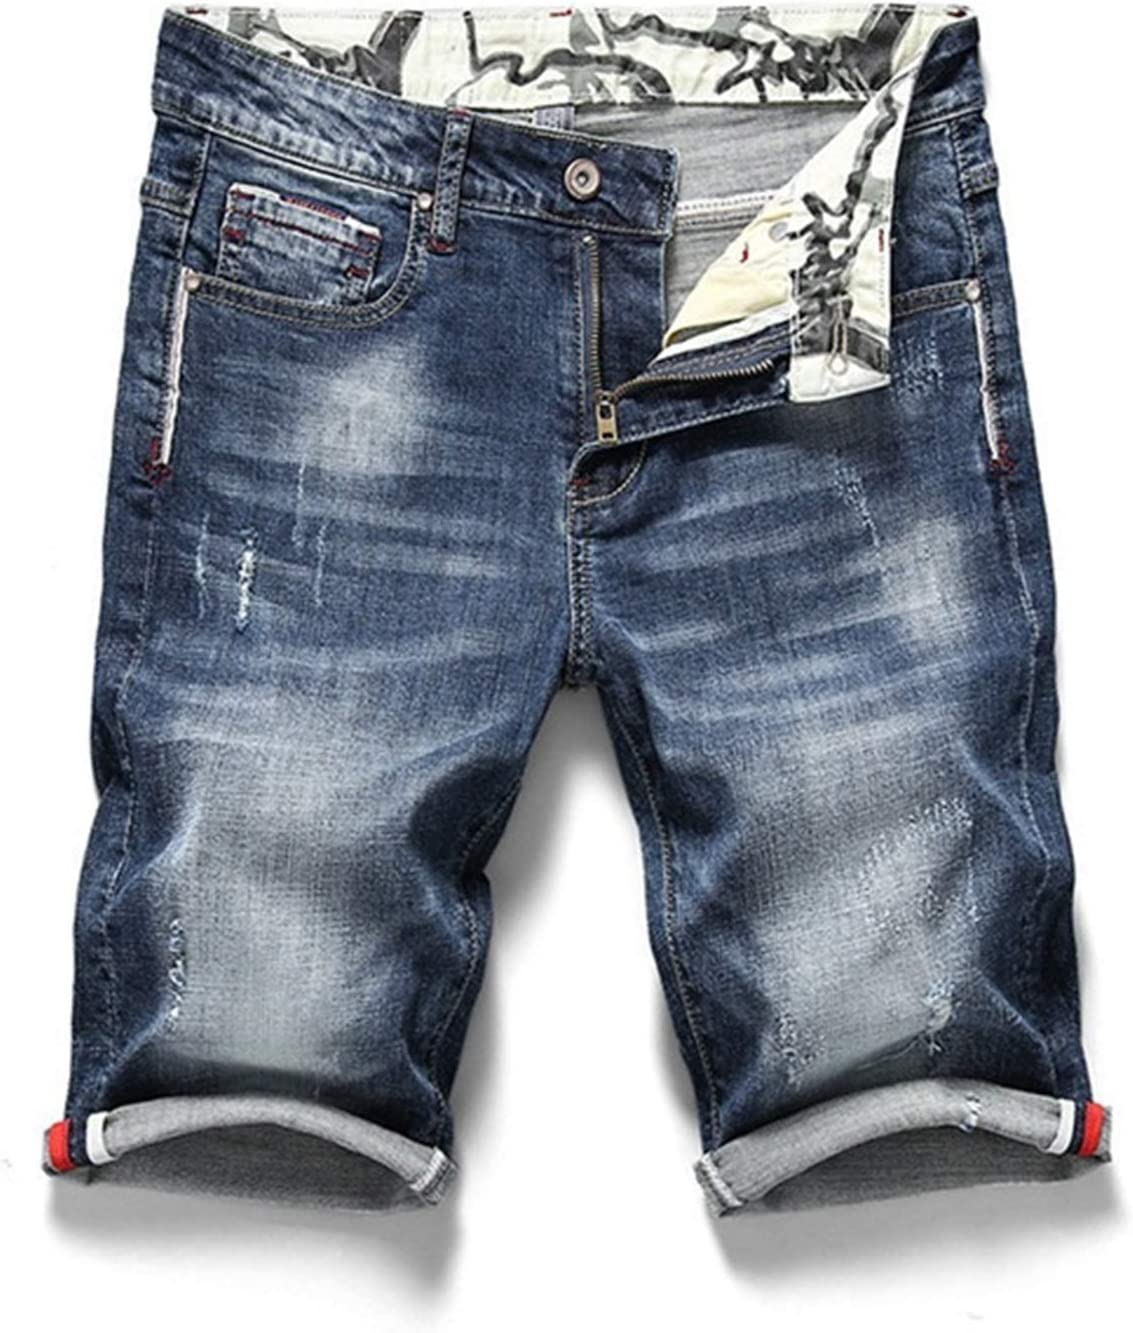 ZZRR ZHUORUIJPN Summer New Man Stretch Short Jeans Fashion Casual Slim Fit of Denim Elastic Shorts Masculine Shorts (Color : Dark Blue, Size : 40)